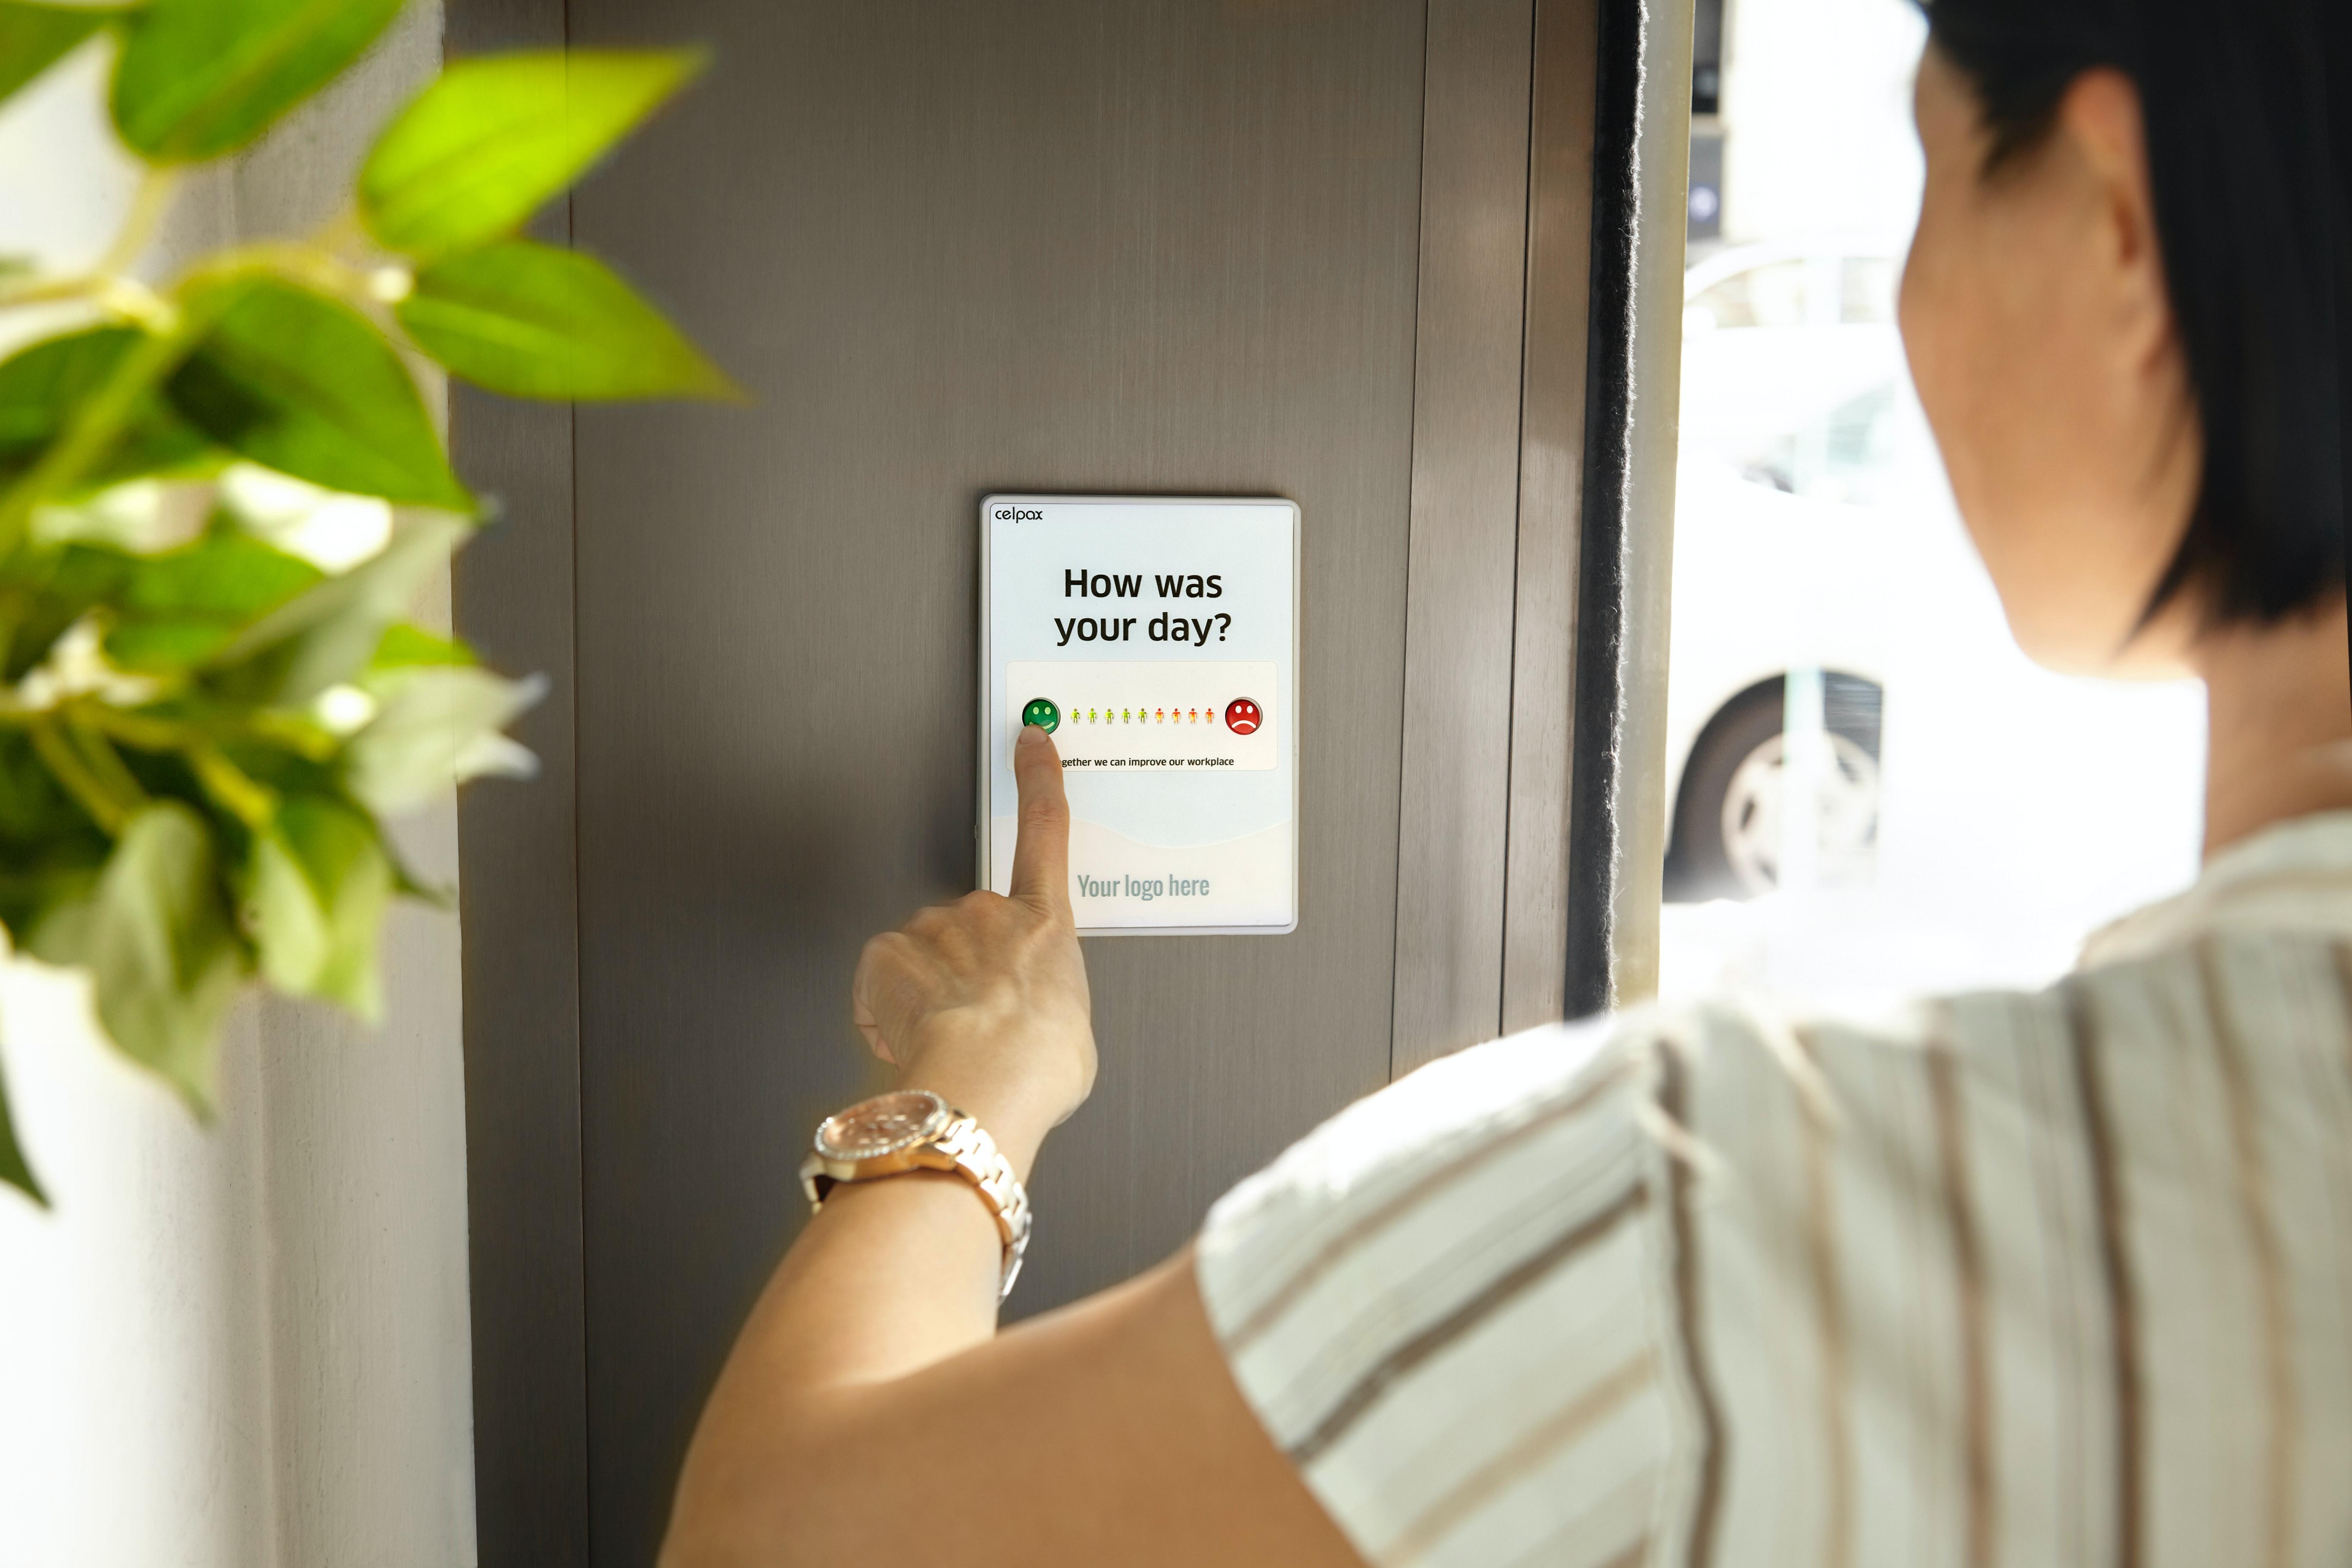 Woman answering a poll on an iPad.